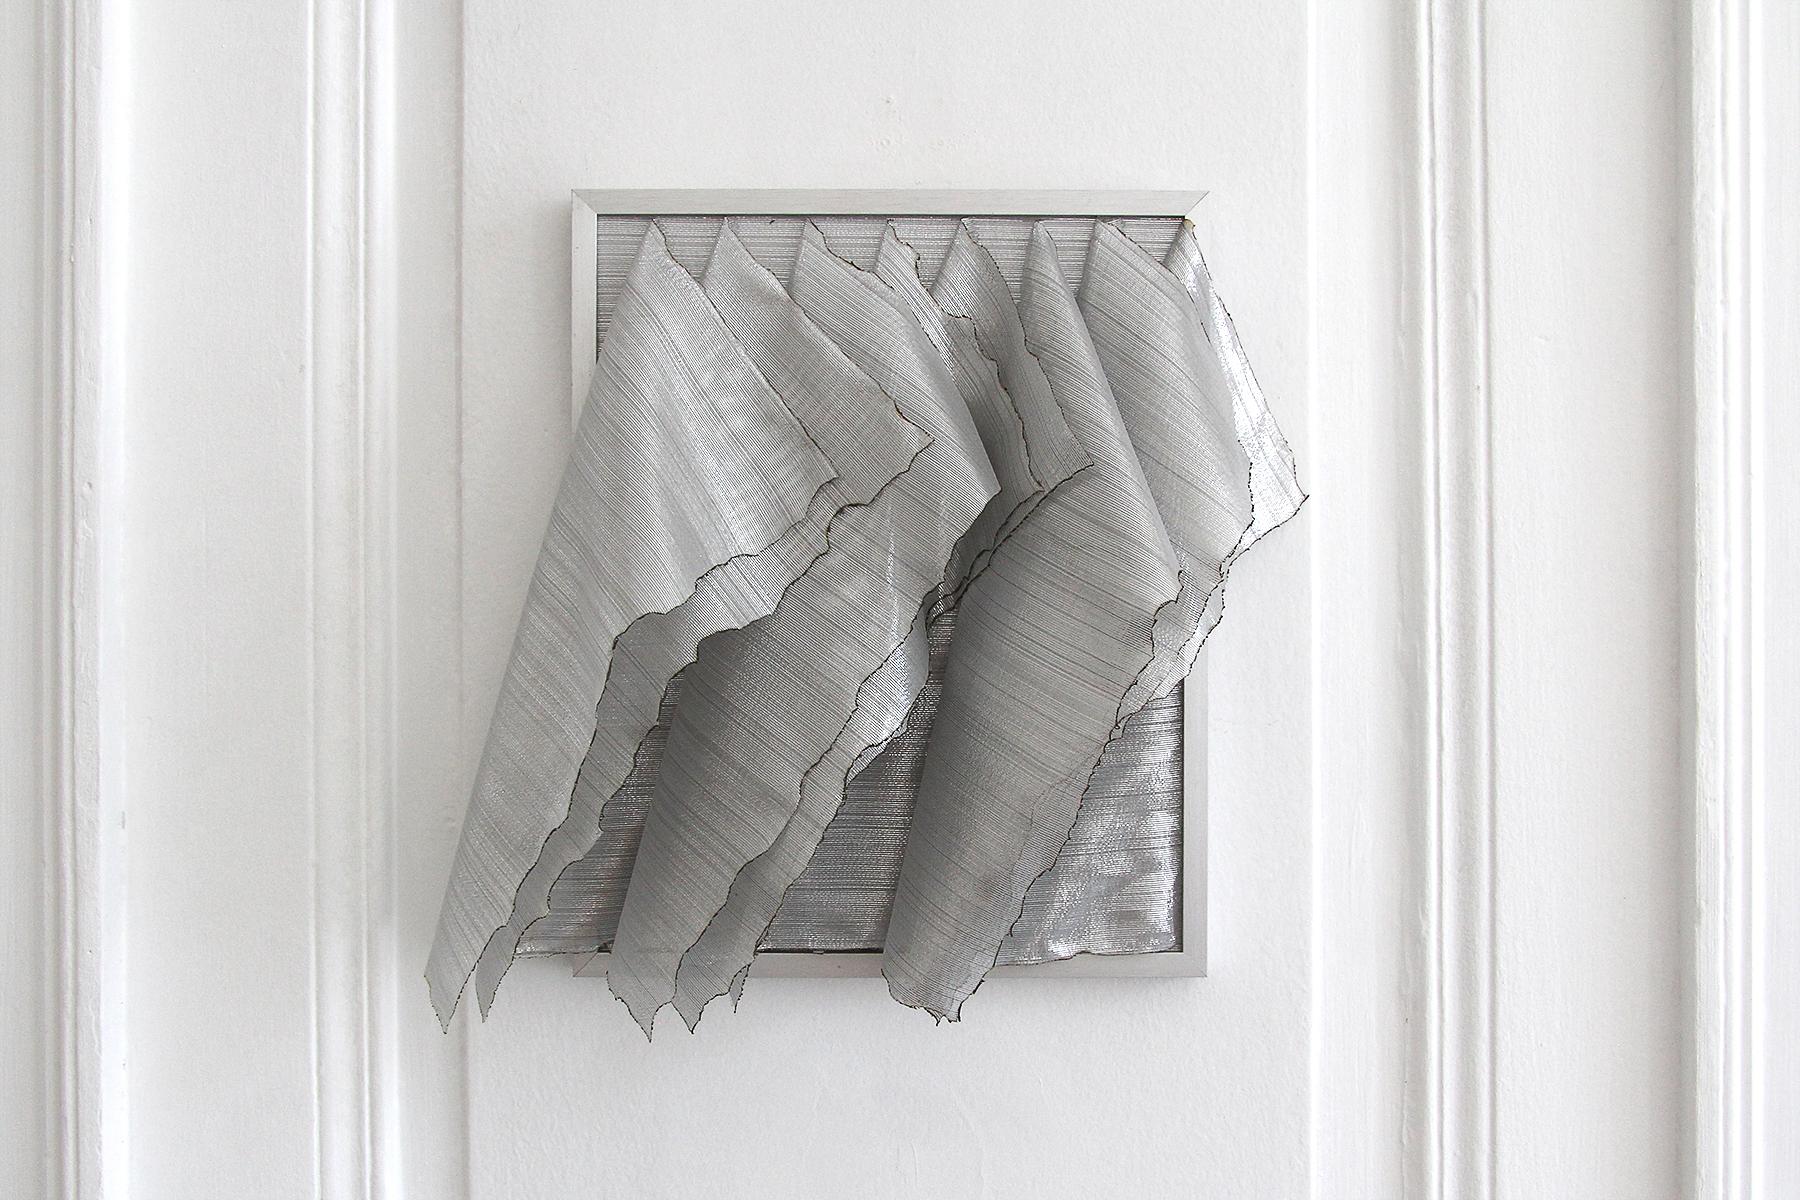 benoit-izard_veils_silk(lurex.and.silk.lamÇ)_2018_13X15inches_$1690.jpg